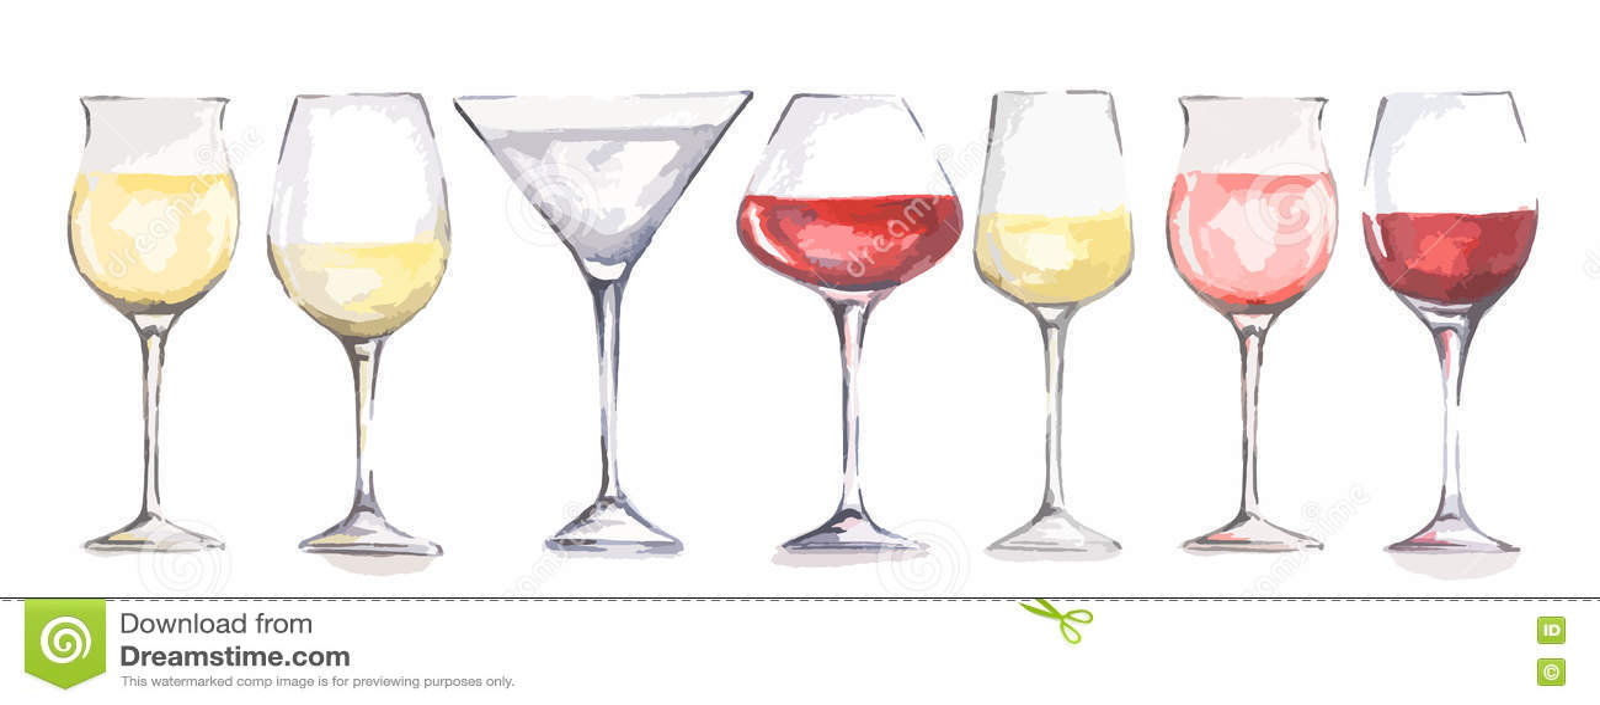 Wine Glasses Vector Illustration CartoonDealercom 16199564 : watercolor wine glasses set beautiful decoration menu restaurant cafe alcoholic beverage 75781148 from cartoondealer.com size 1300 x 590 jpeg 57kB